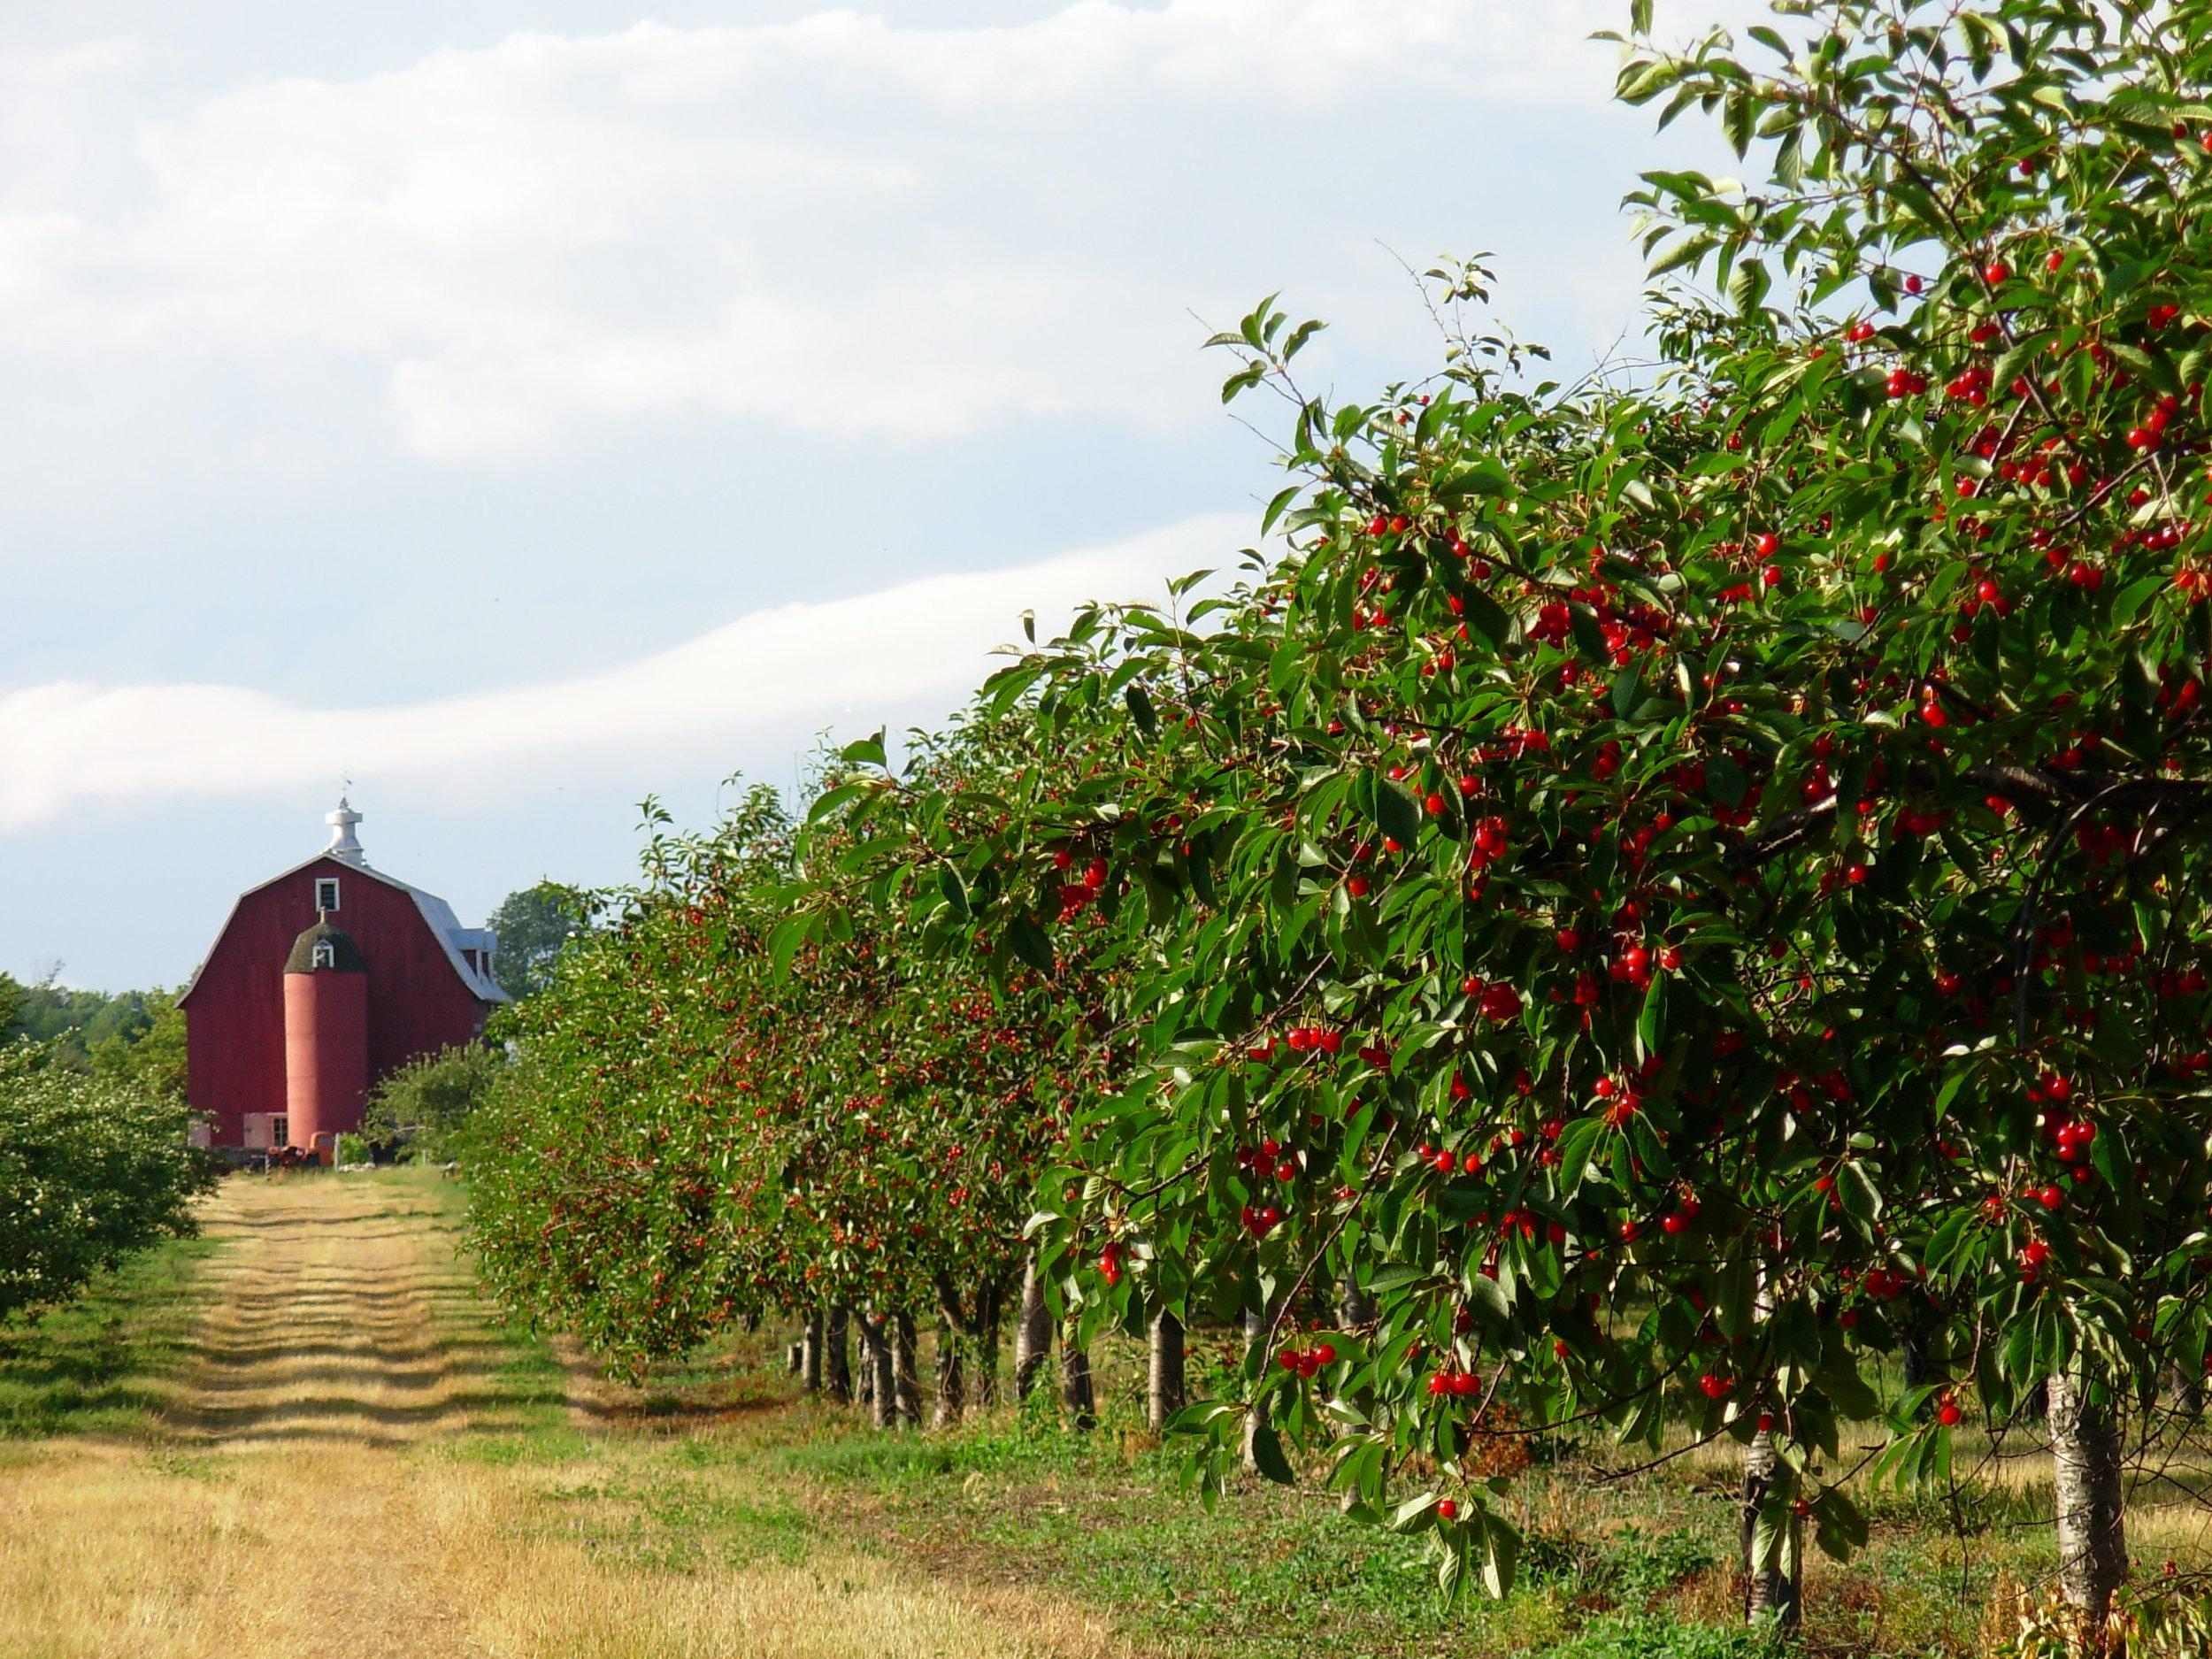 Lautenbach's Orchard just outside Fish Creek